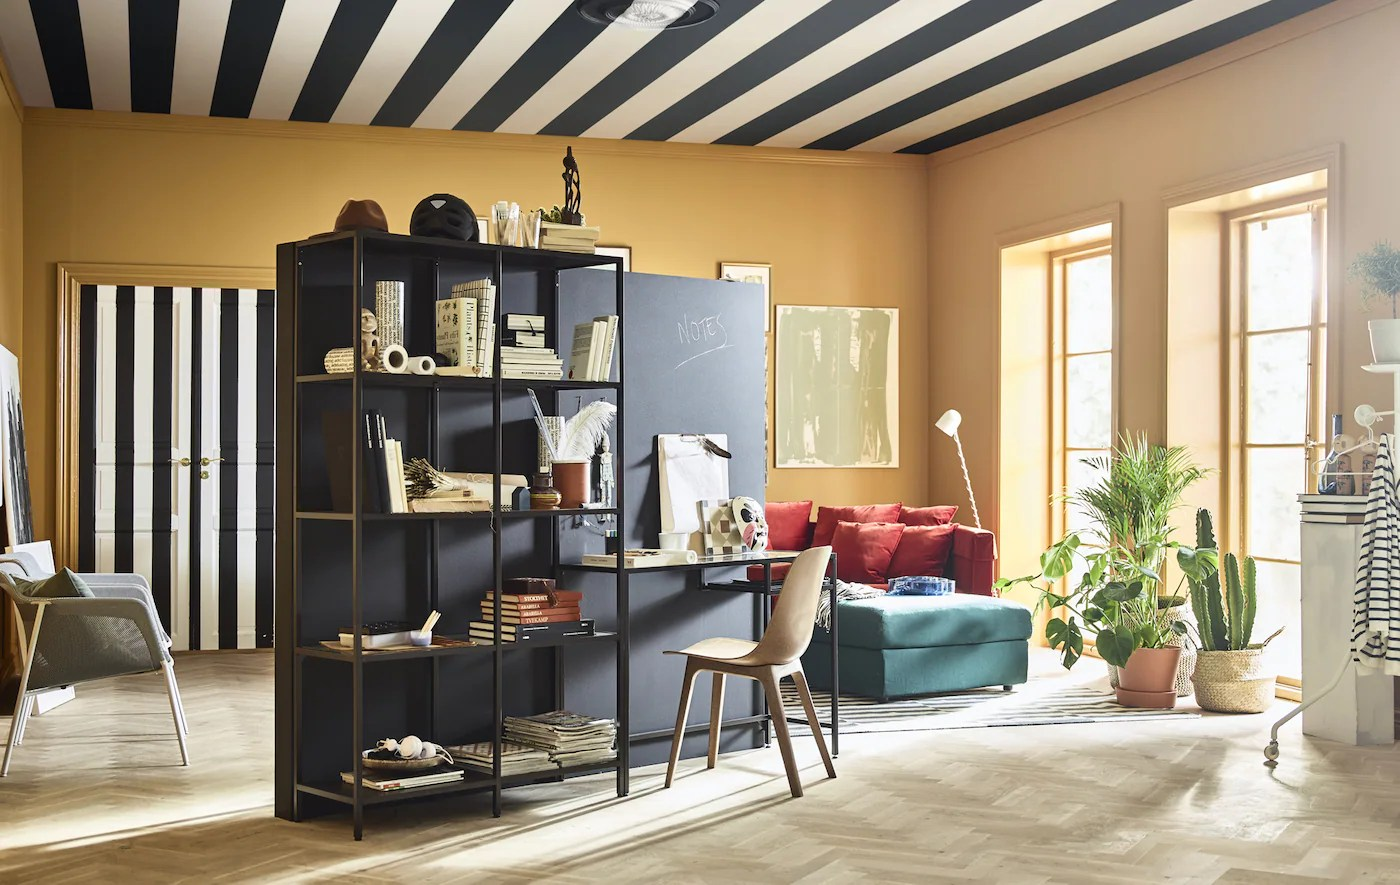 Stylistens Stue Sasas Moderne Vri Pa Ei Tradisjonell Stue Ikea